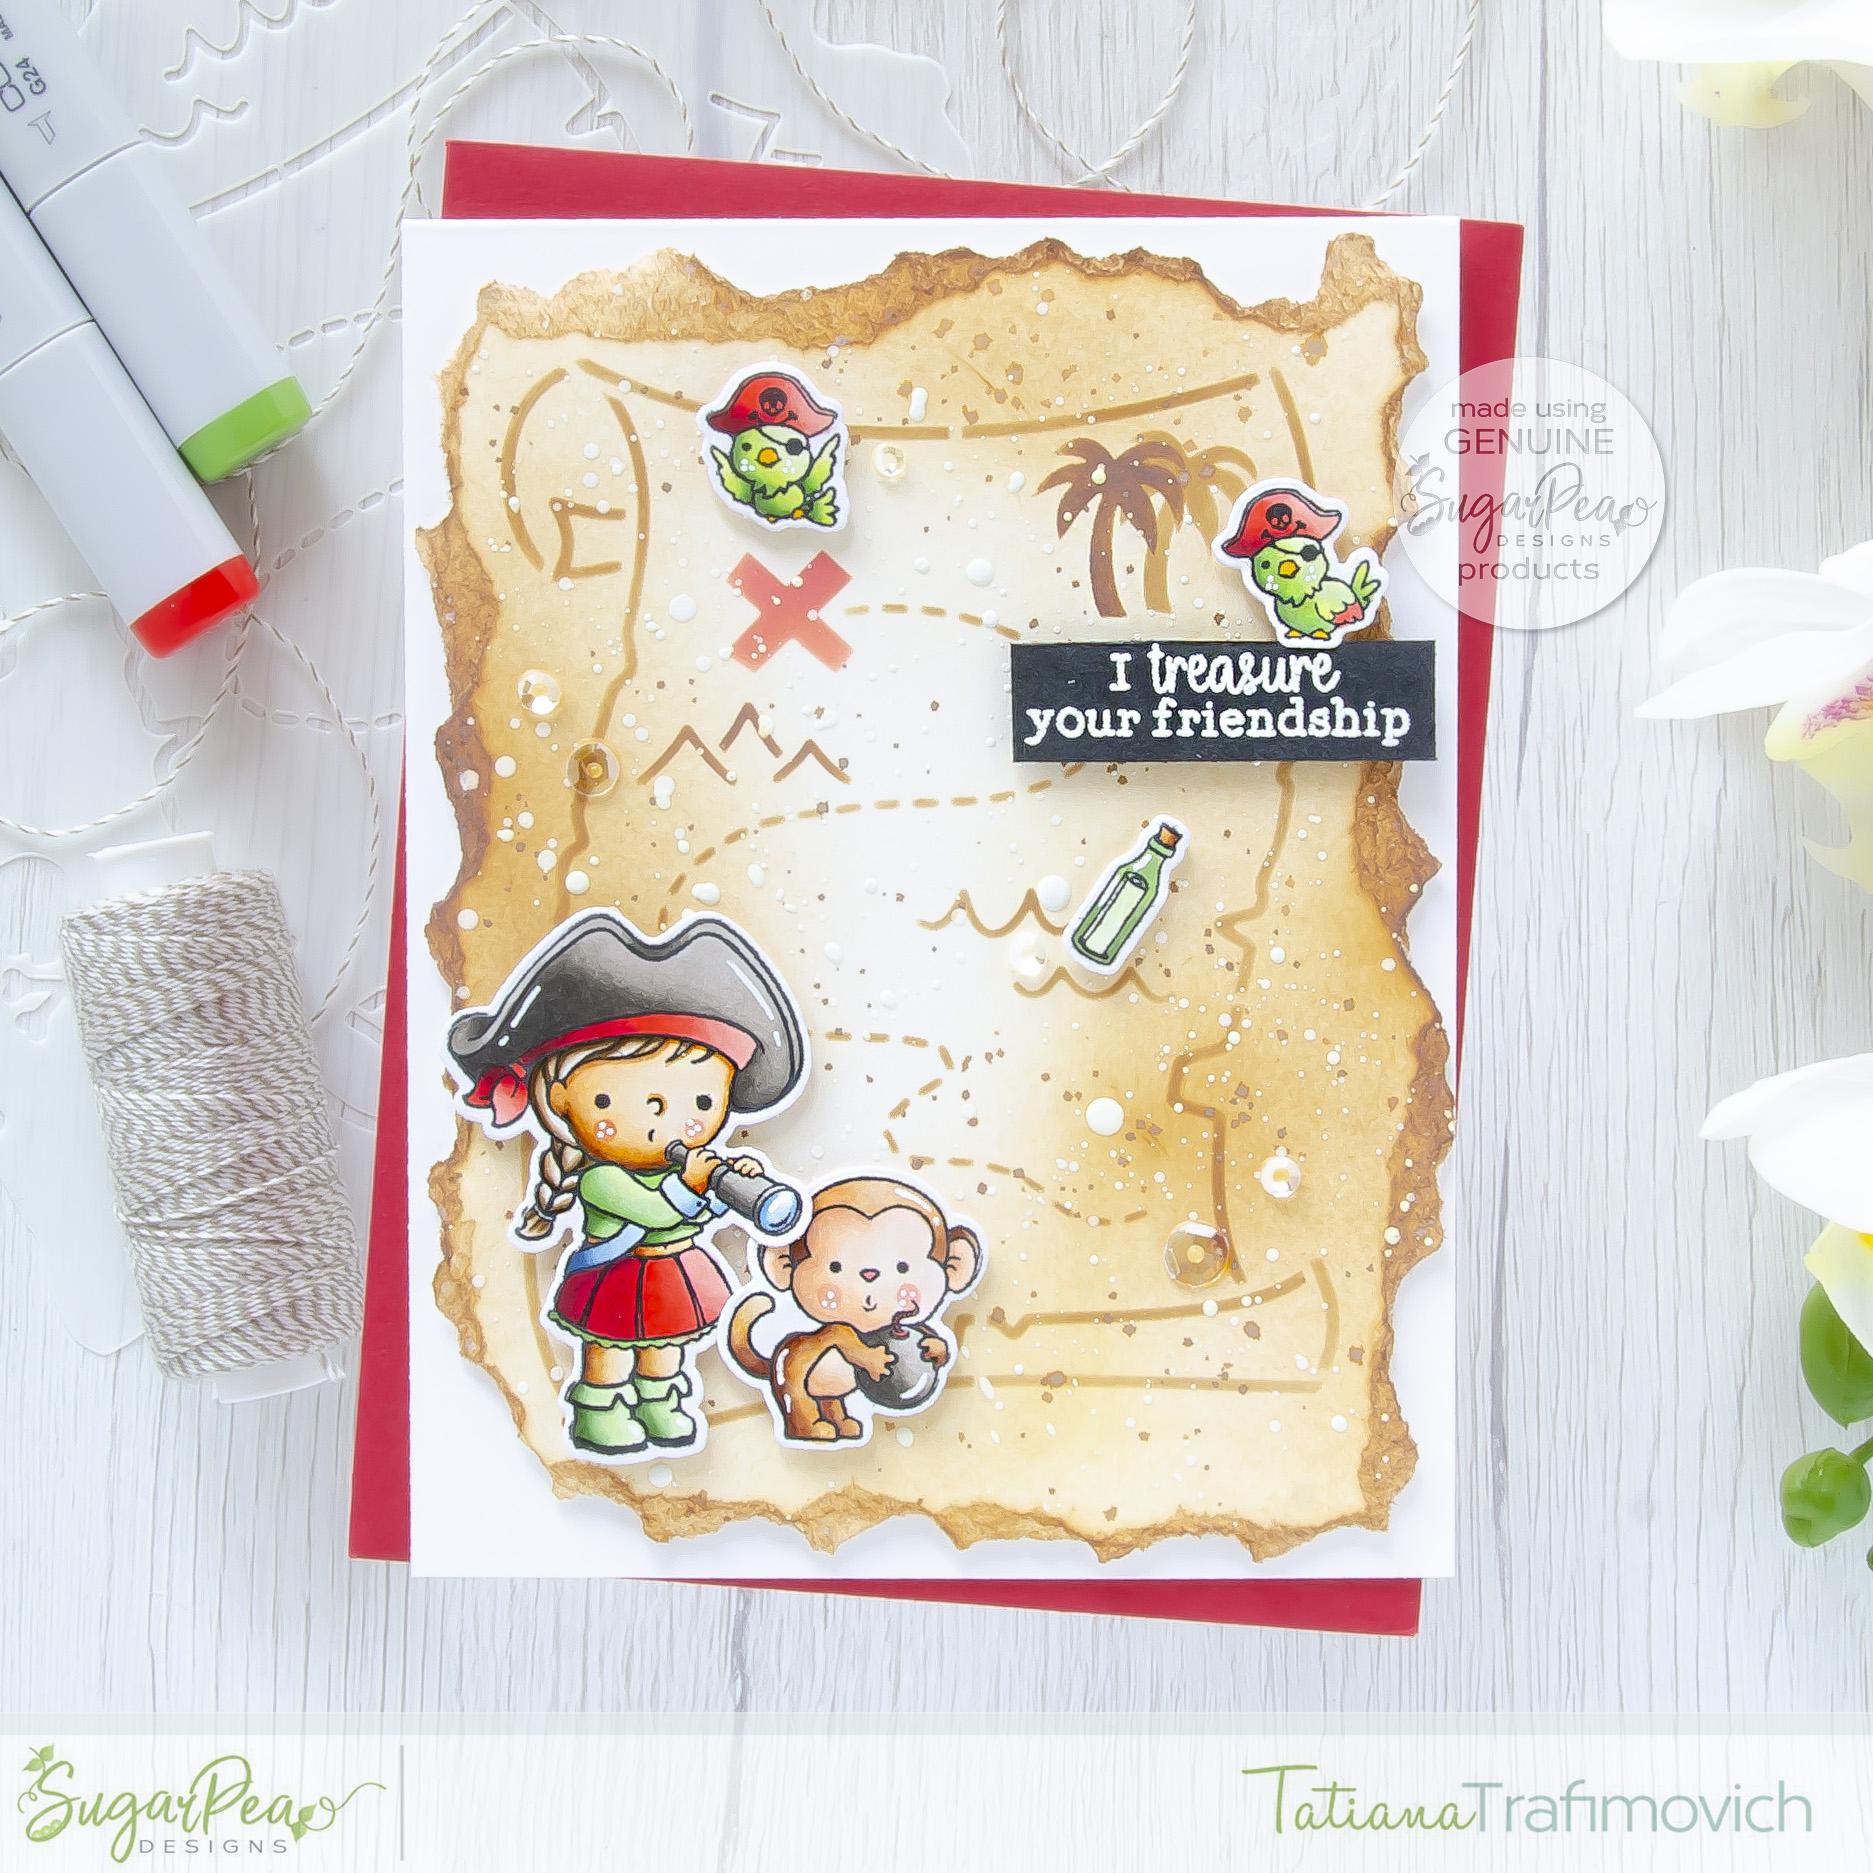 I TREASURE Your Friendship #handmade card by Tatiana Trafimovich #tatianacraftandart - Captain of My Heart stamp set by SugarPea Designs #sugarpeadesigns